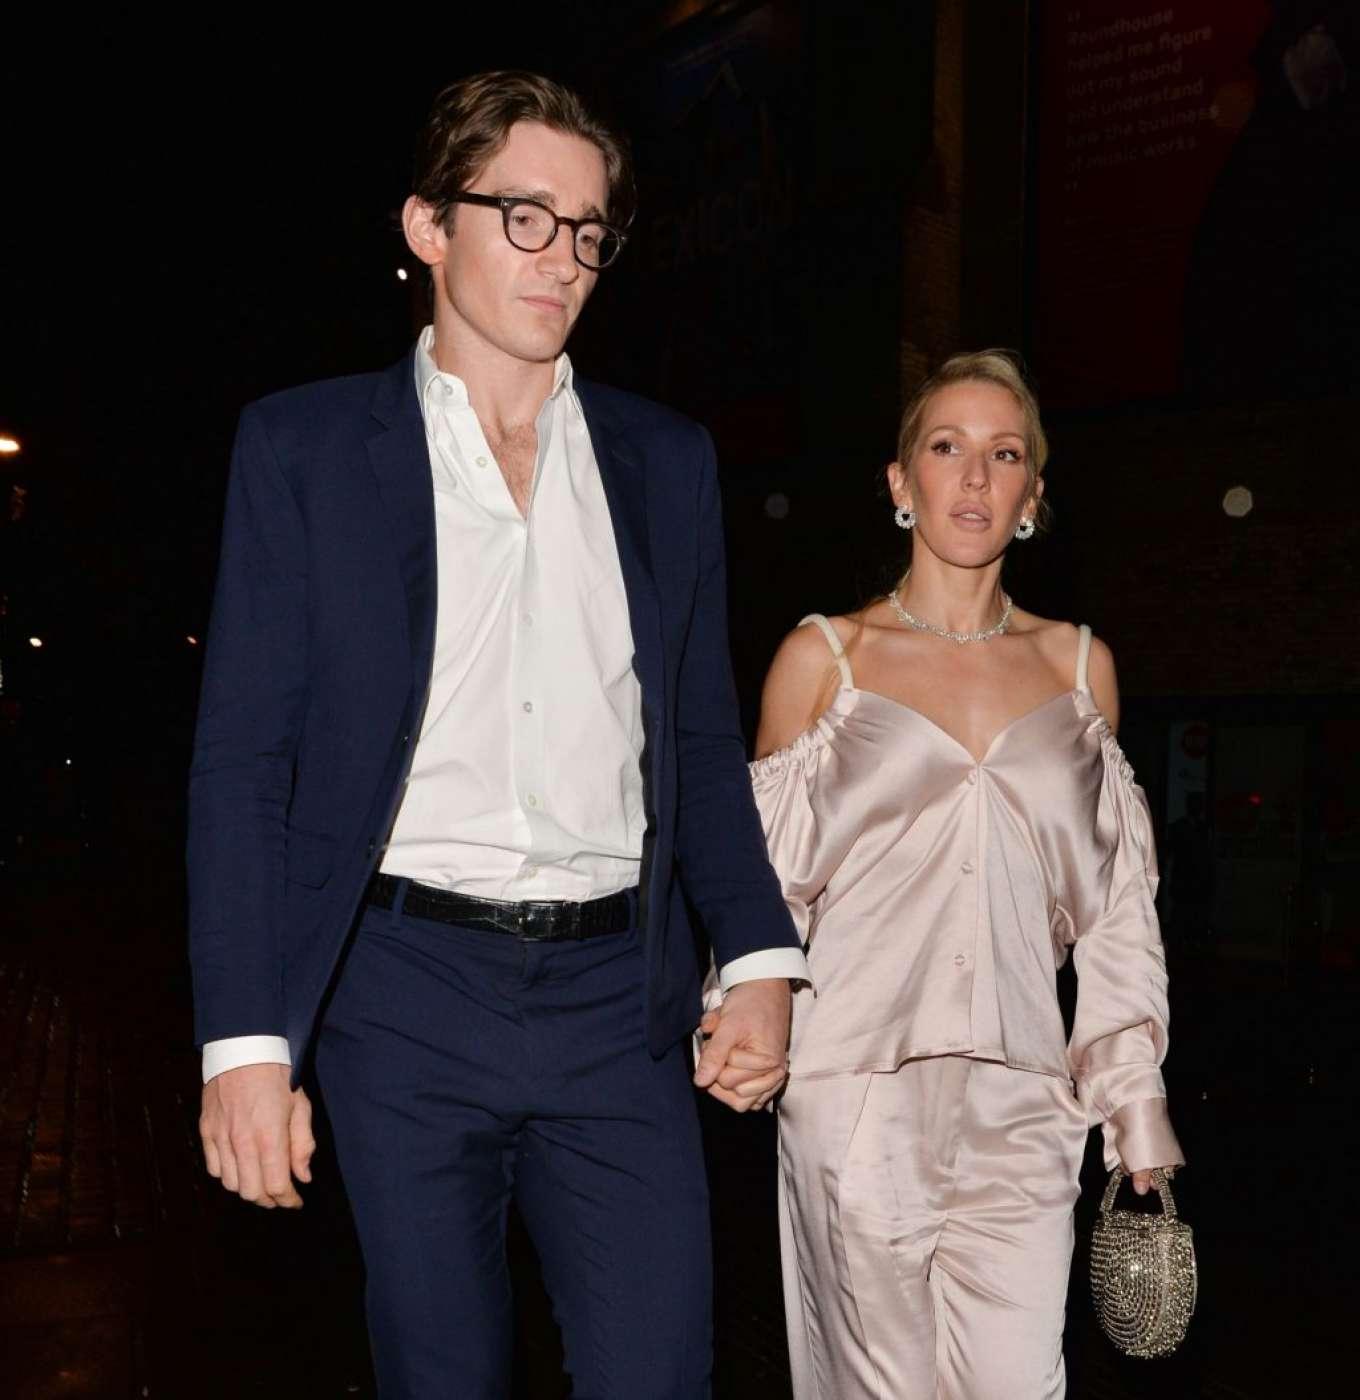 Ellie Goulding 2019 : Ellie Goulding and her husband Jaspar Copling were seen leaving the Roundhouse in Camden – London-16